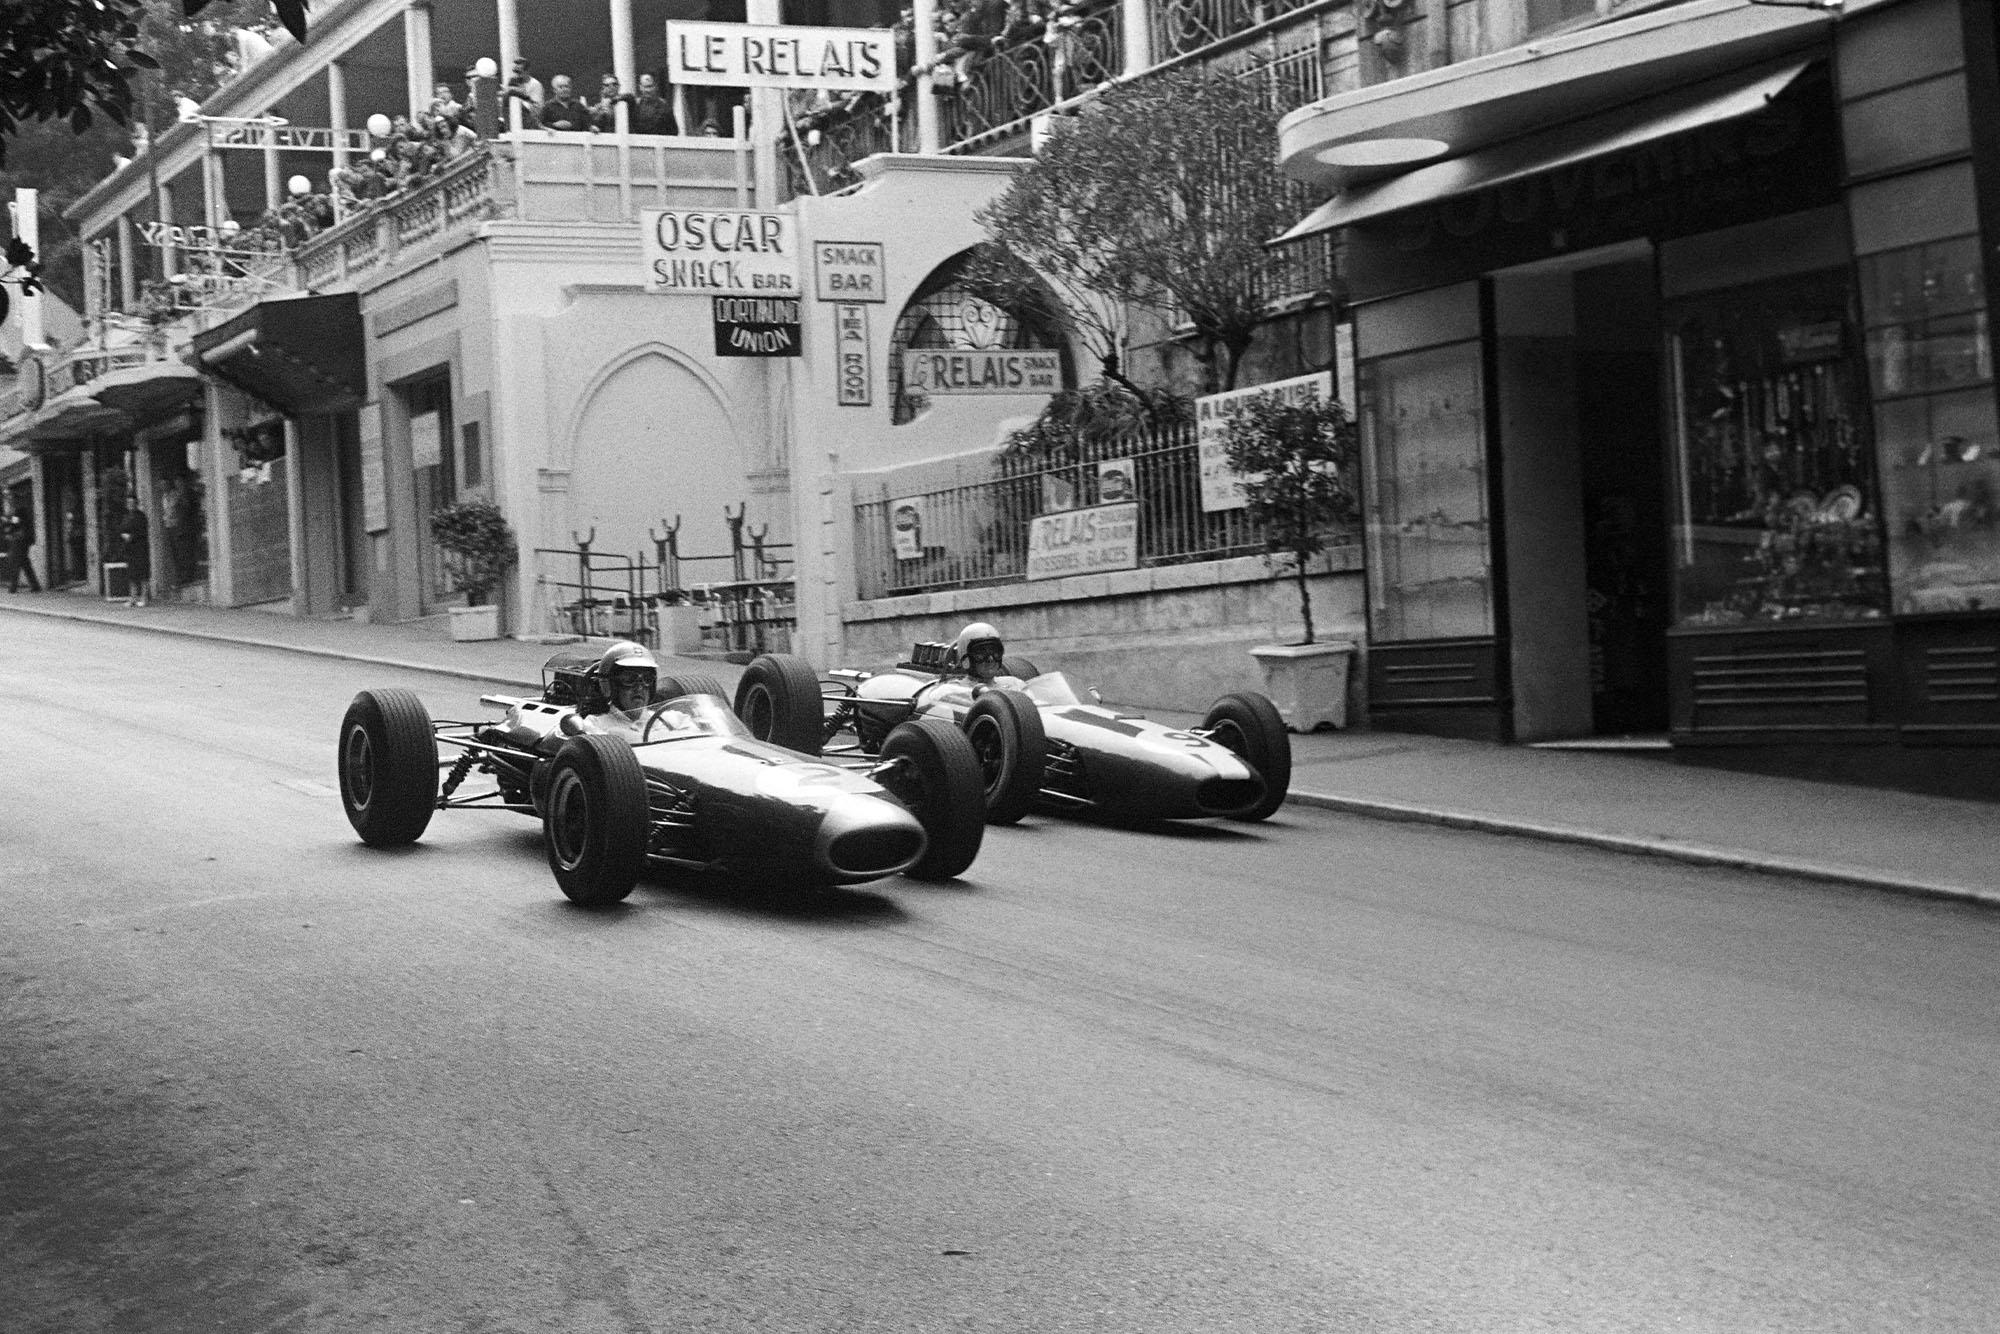 Denny Hulme, Brabham BT7 Climax, battles with Bob Anderson, Brabham BT11 Climax.